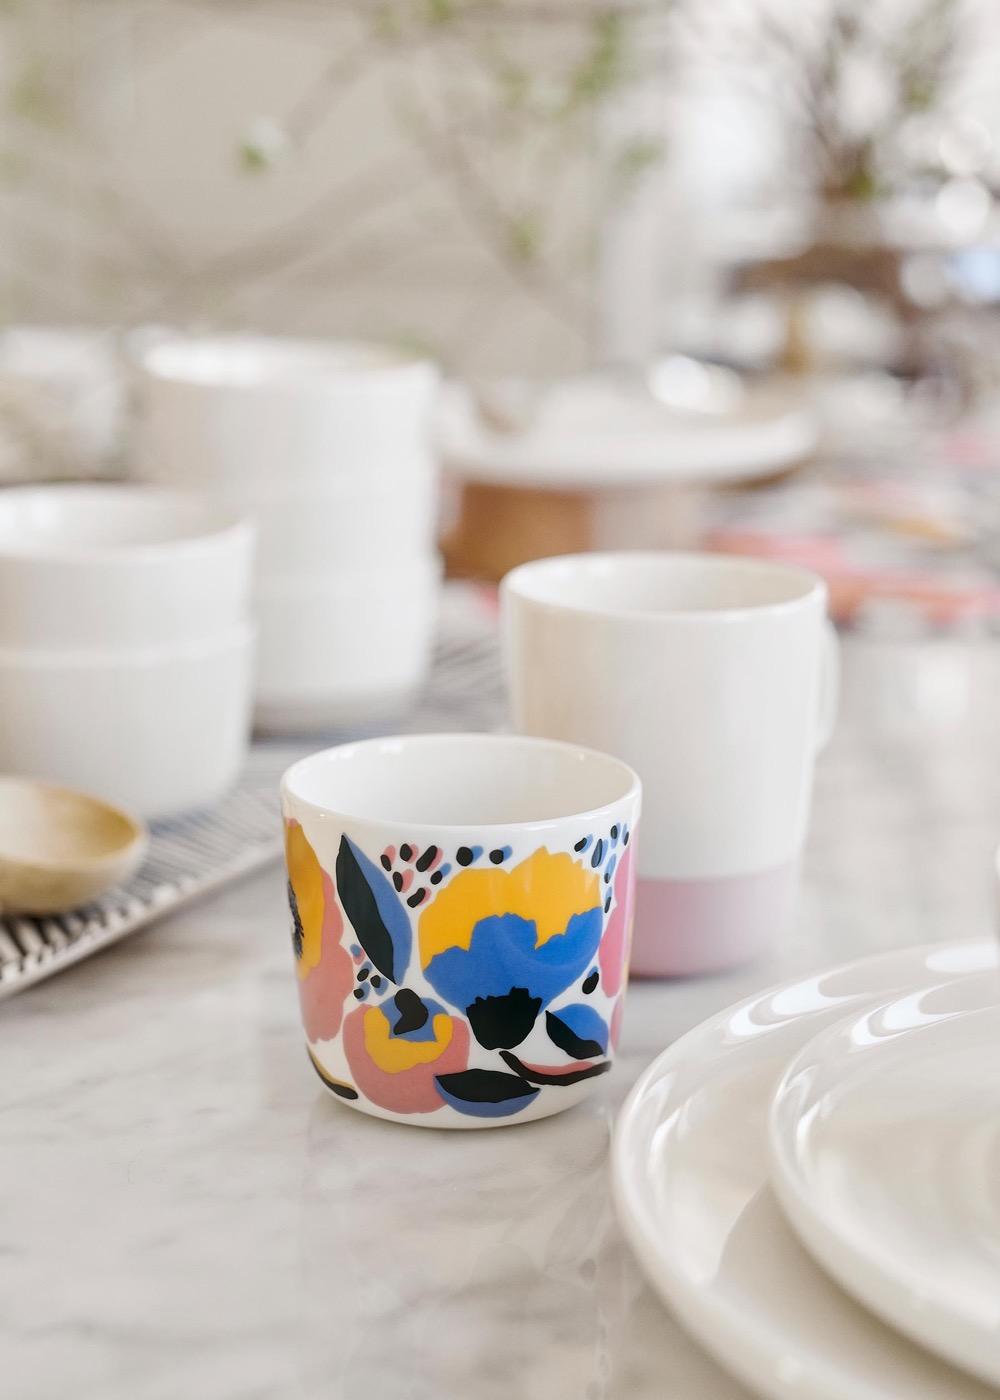 Marimekko-fall-2018-home-collection-the-impression-04